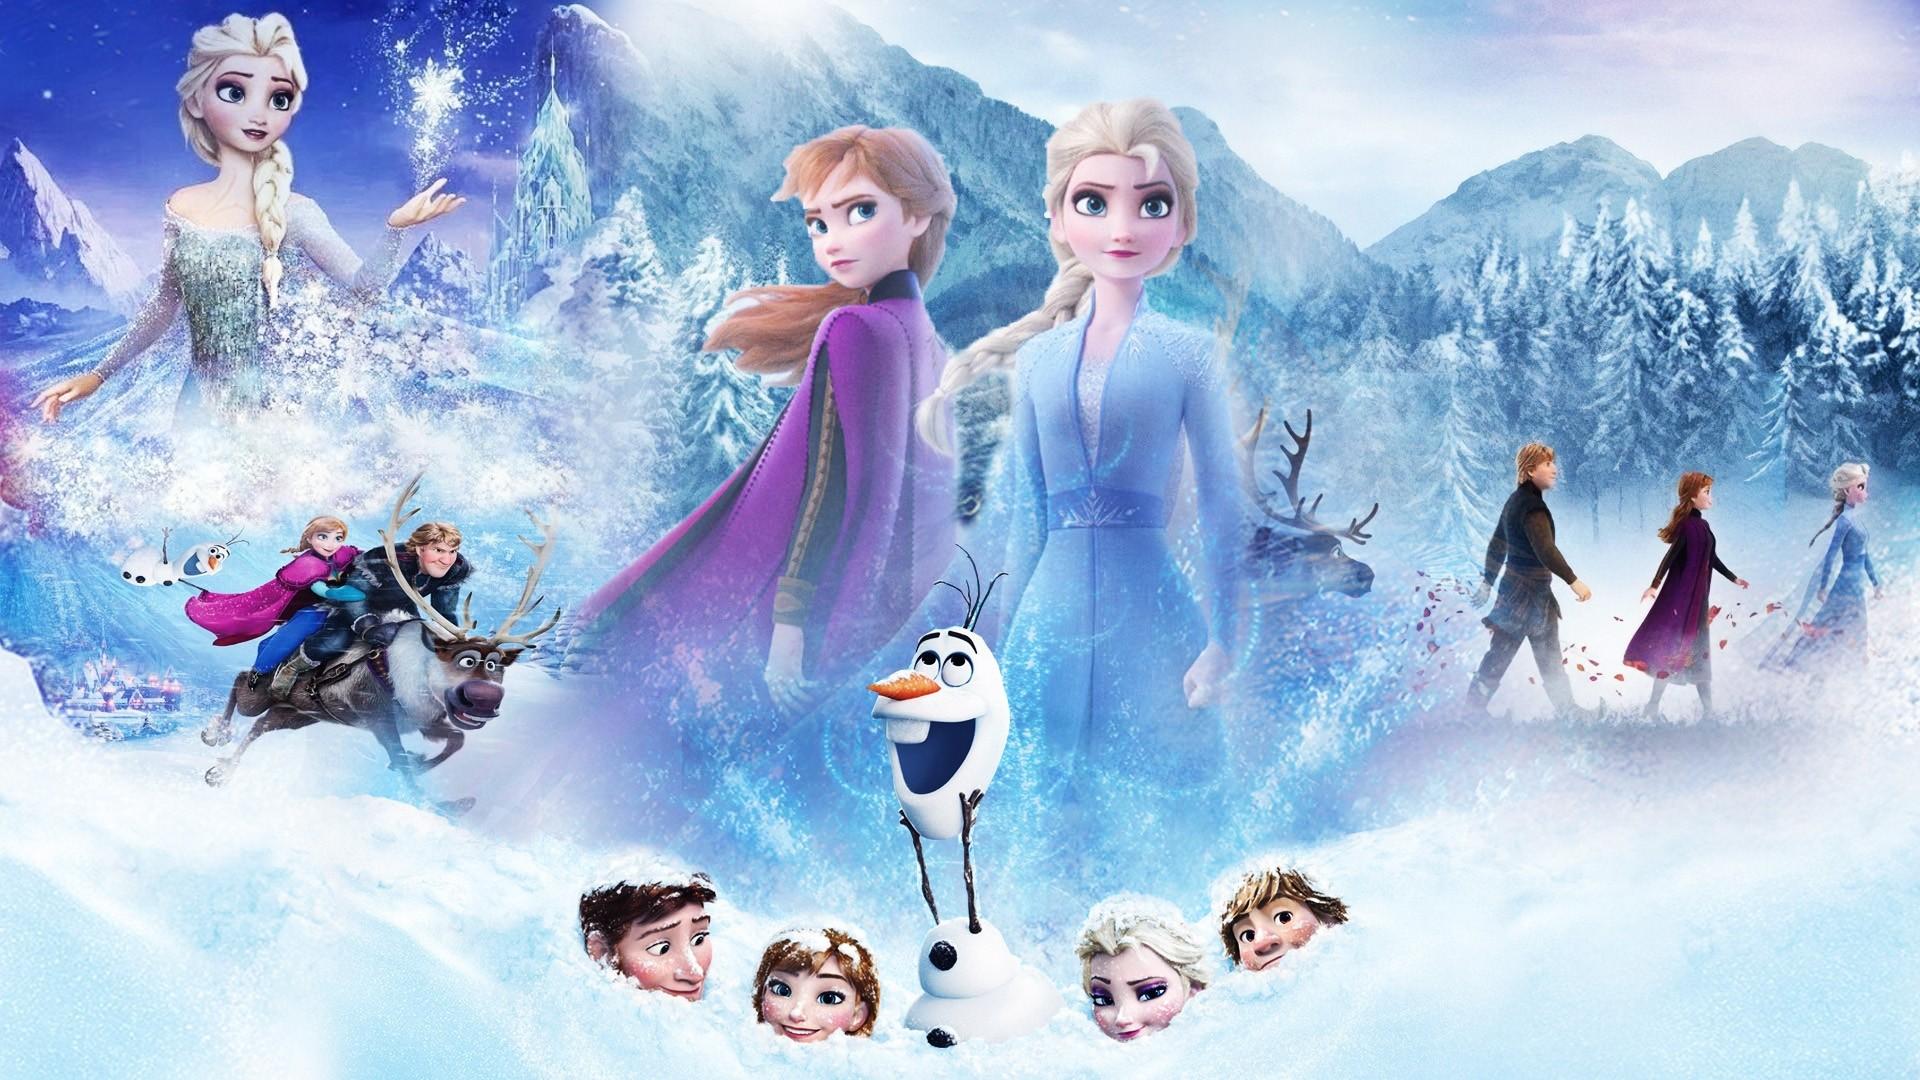 Frozen 2 Wallpapers (31 images) - WallpaperBoat